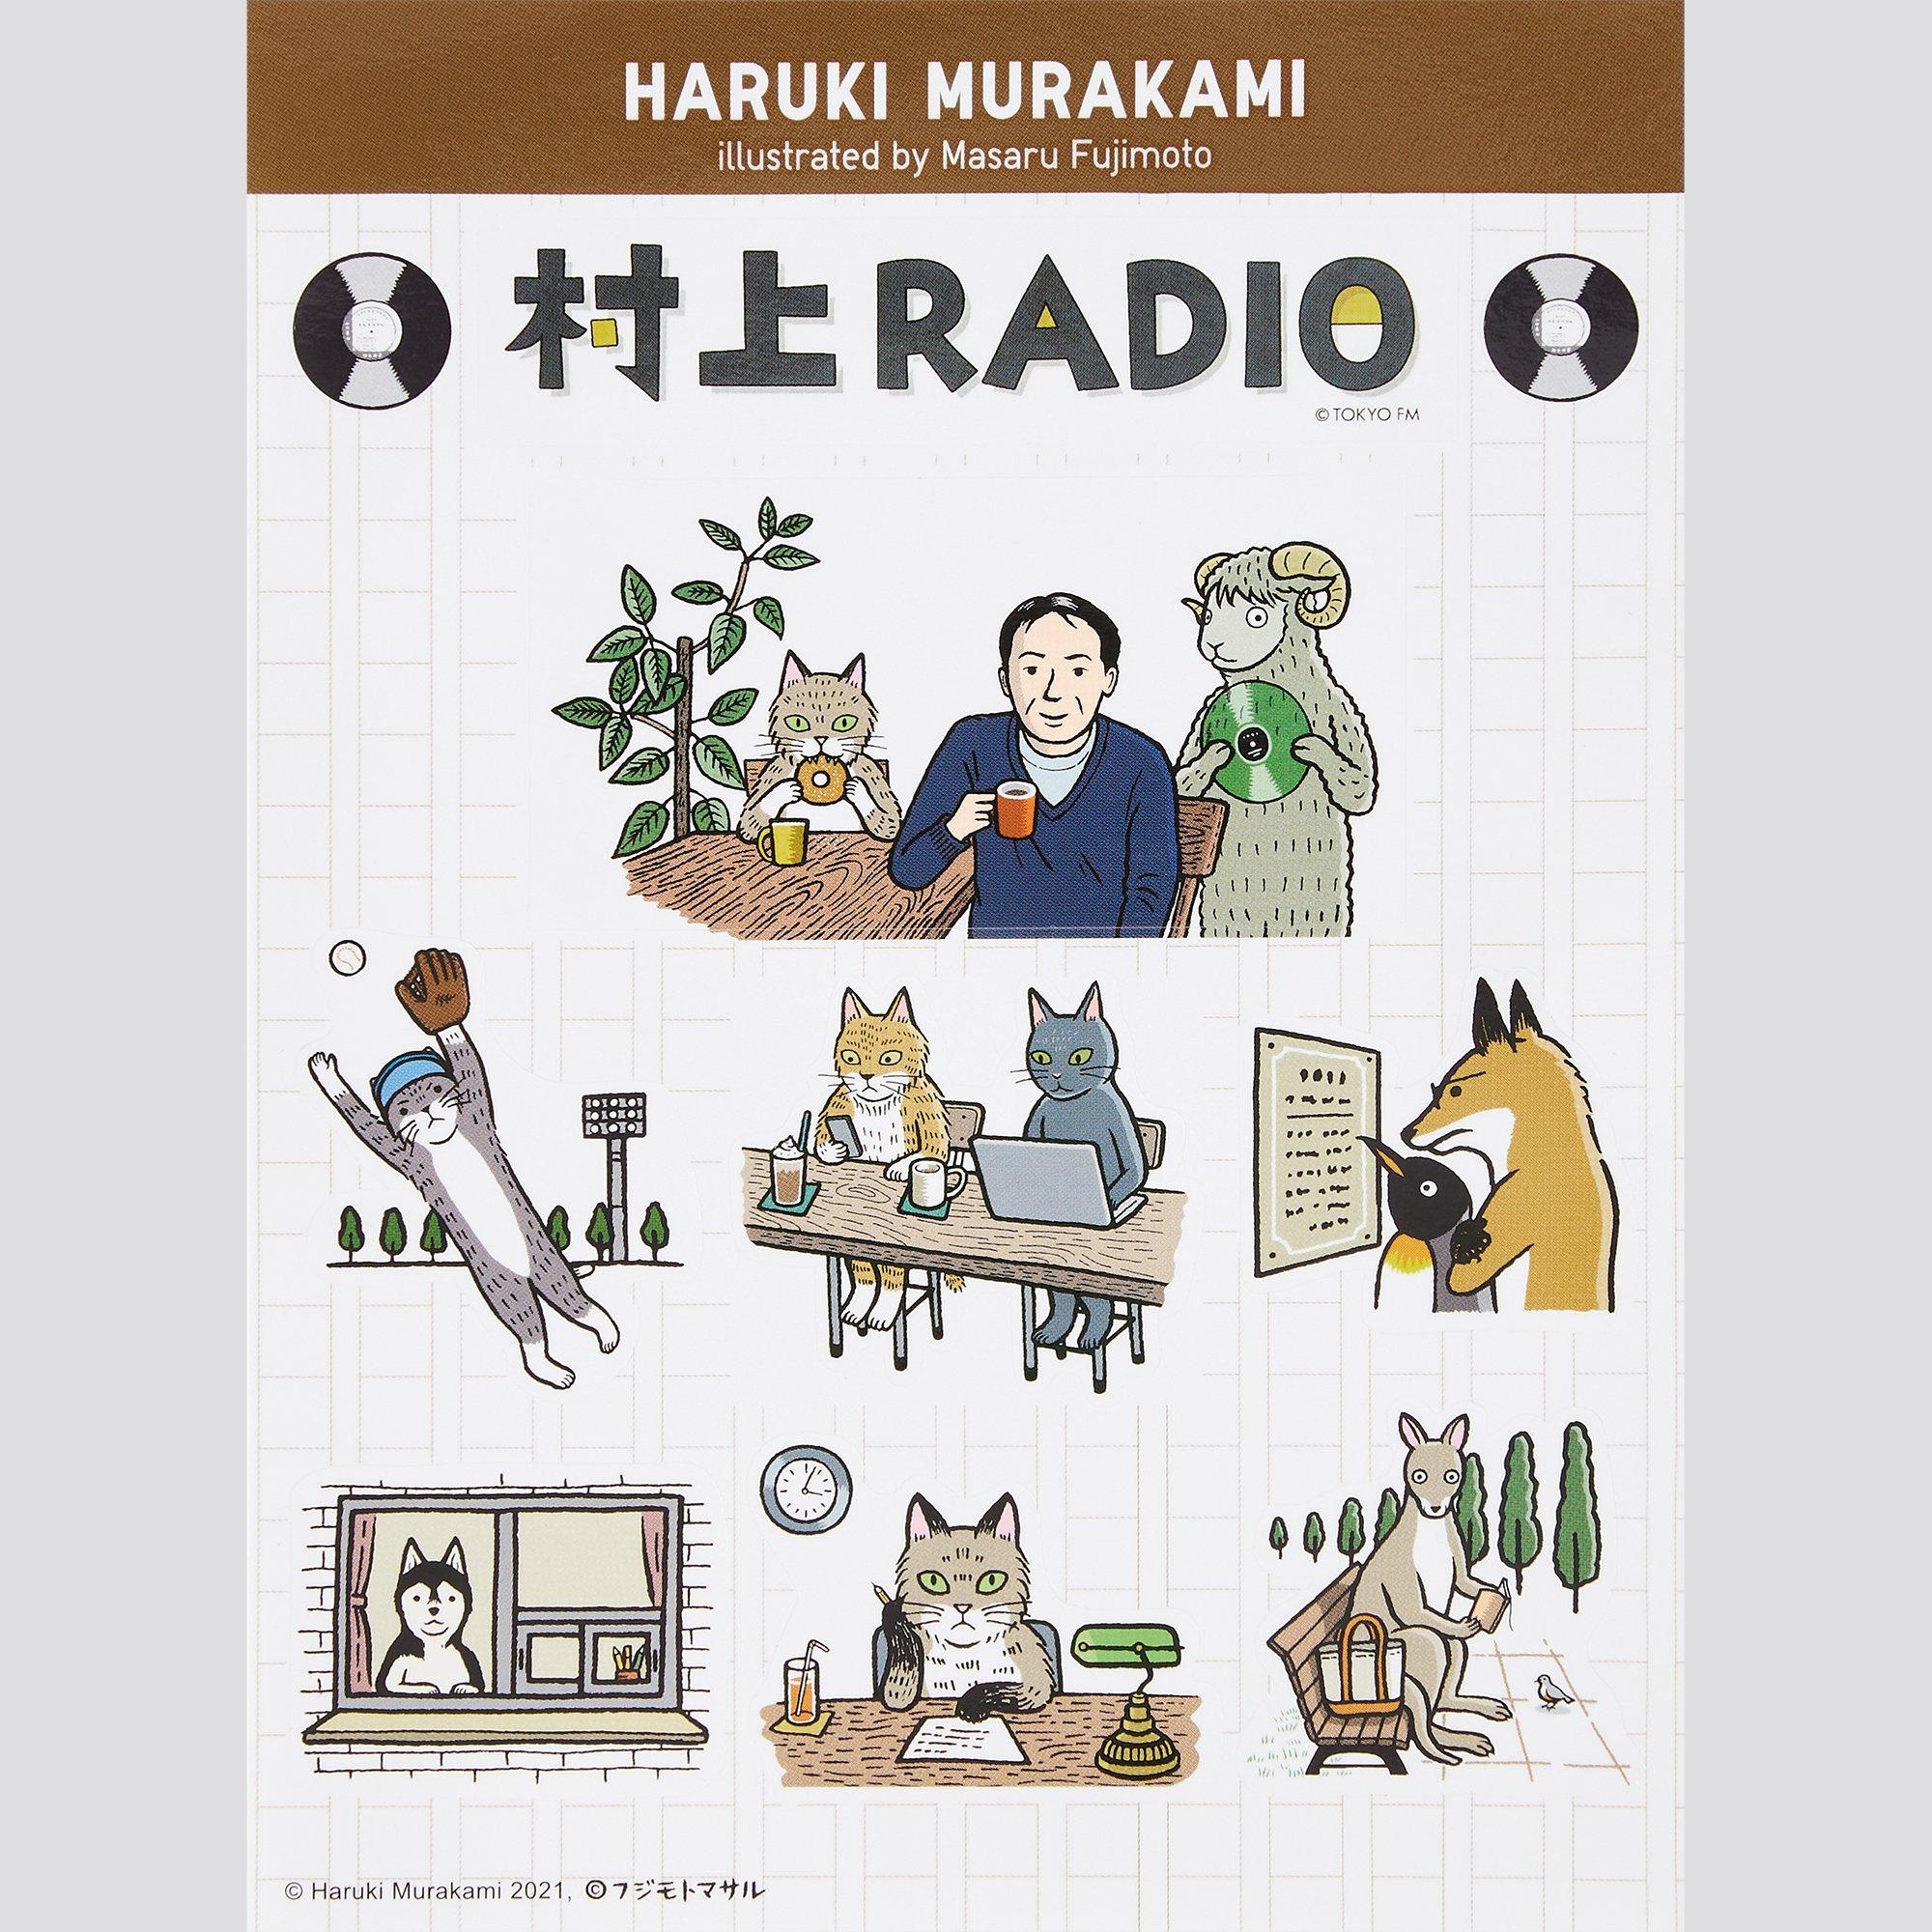 Uniqlo brings the creative world of Haruki Murakami to its new UT collection 23